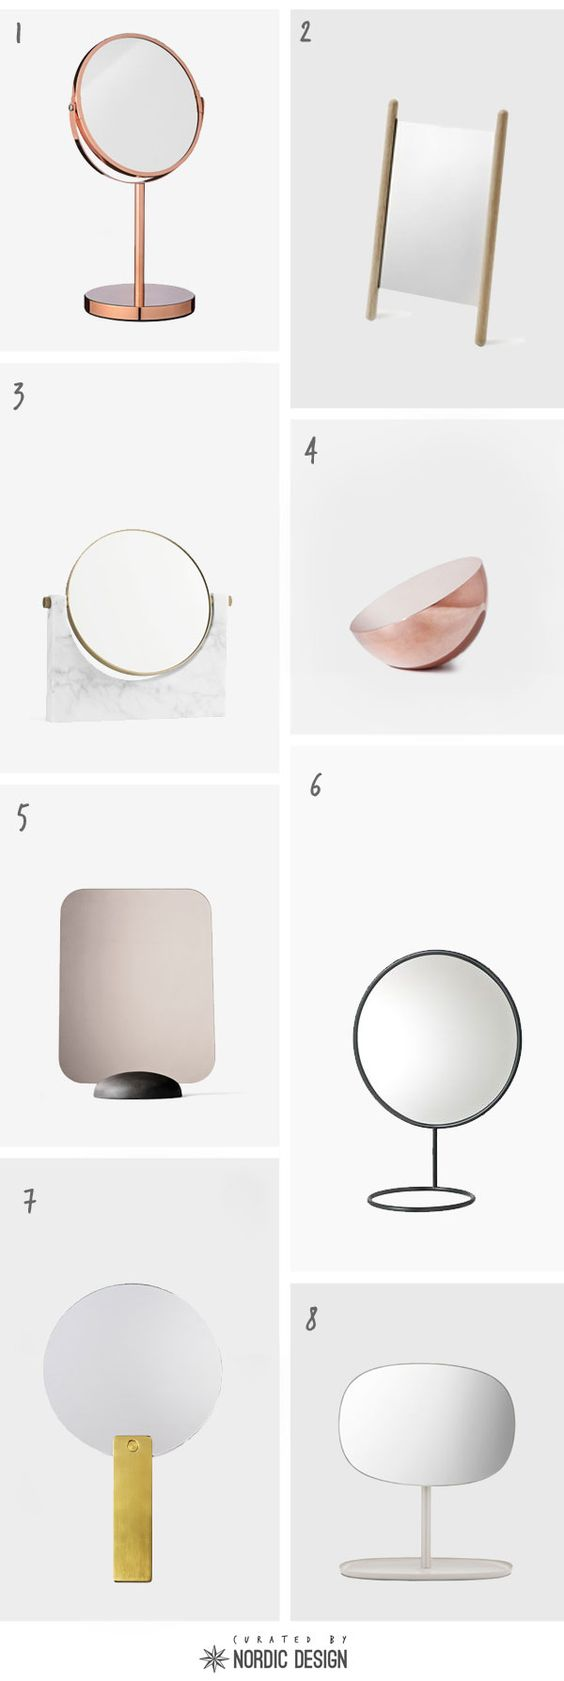 8 Beautiful Table Mirrors from Scandinavian Designers & Brands